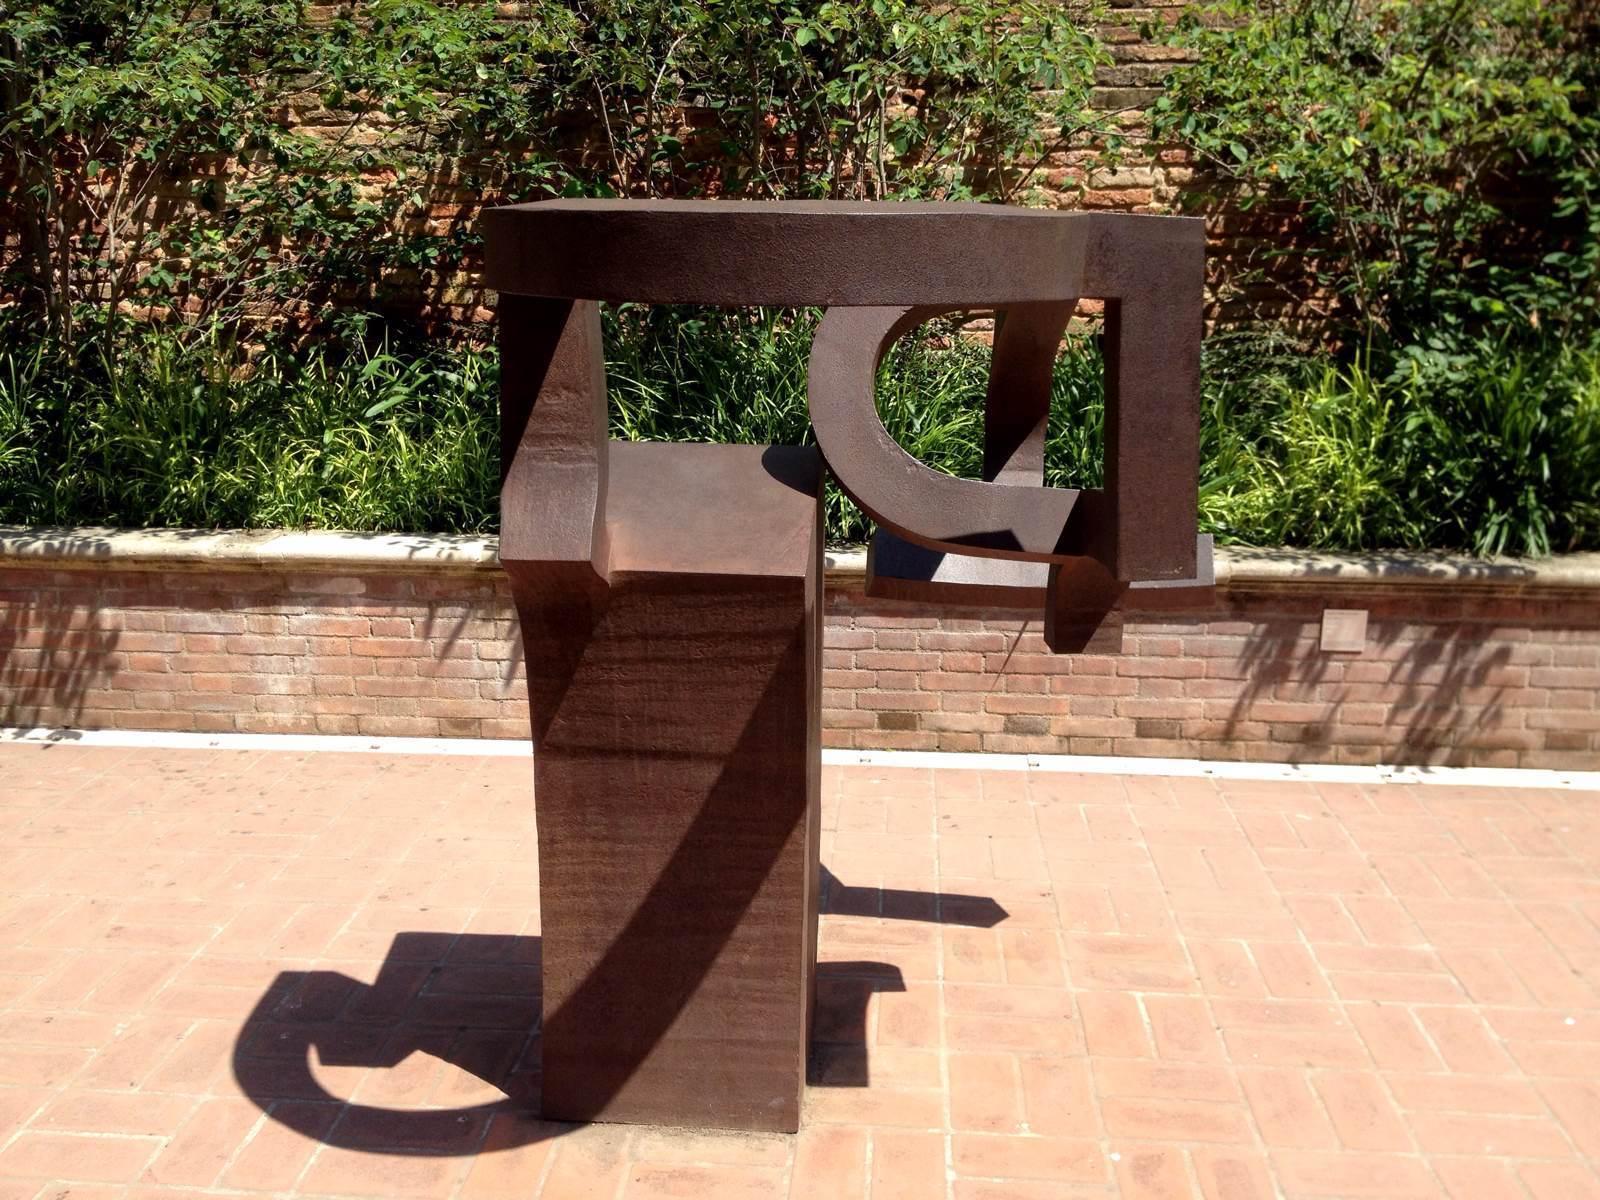 佩姬·古根汉美术馆  Peggy Guggenheim Collection   -1